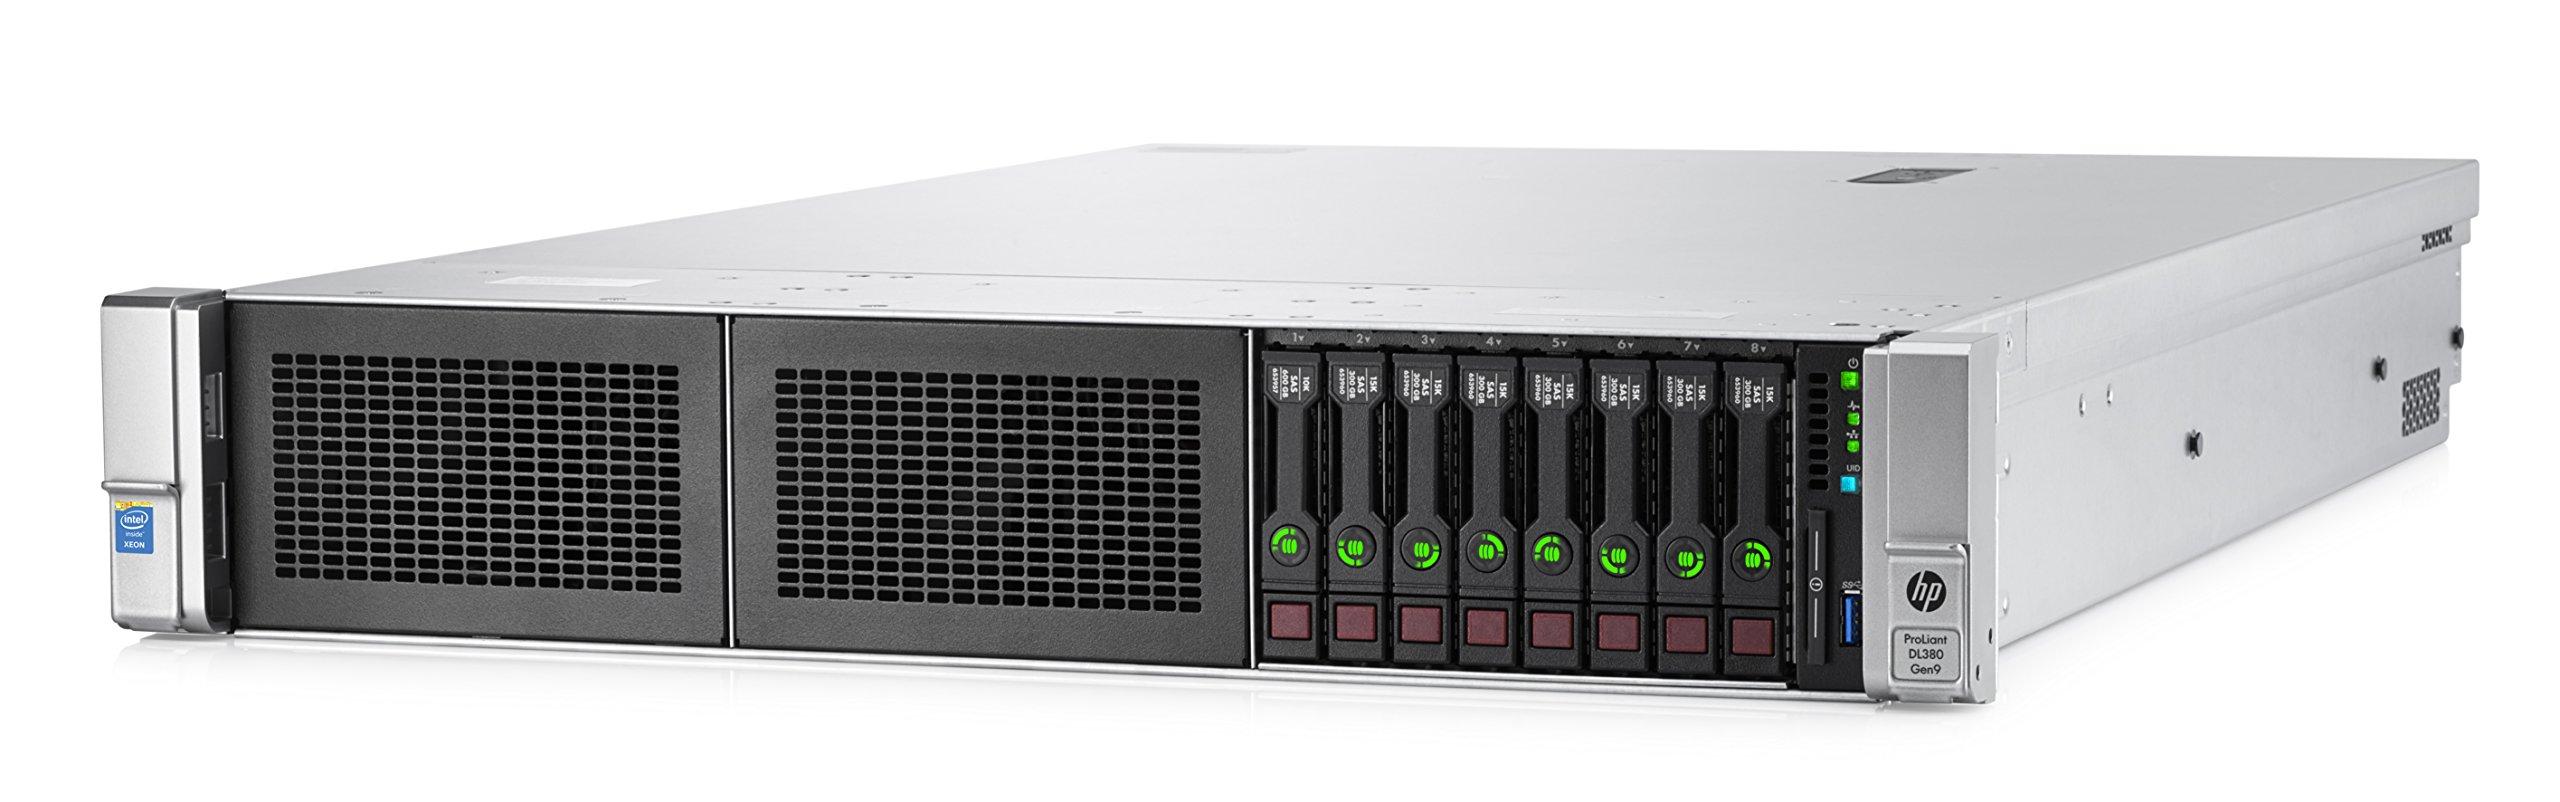 HPE 752689-B21 ProLiant DL380 Gen9 Performance Server, 32 GB RAM, No HDD, Matrox G200eH2, Black